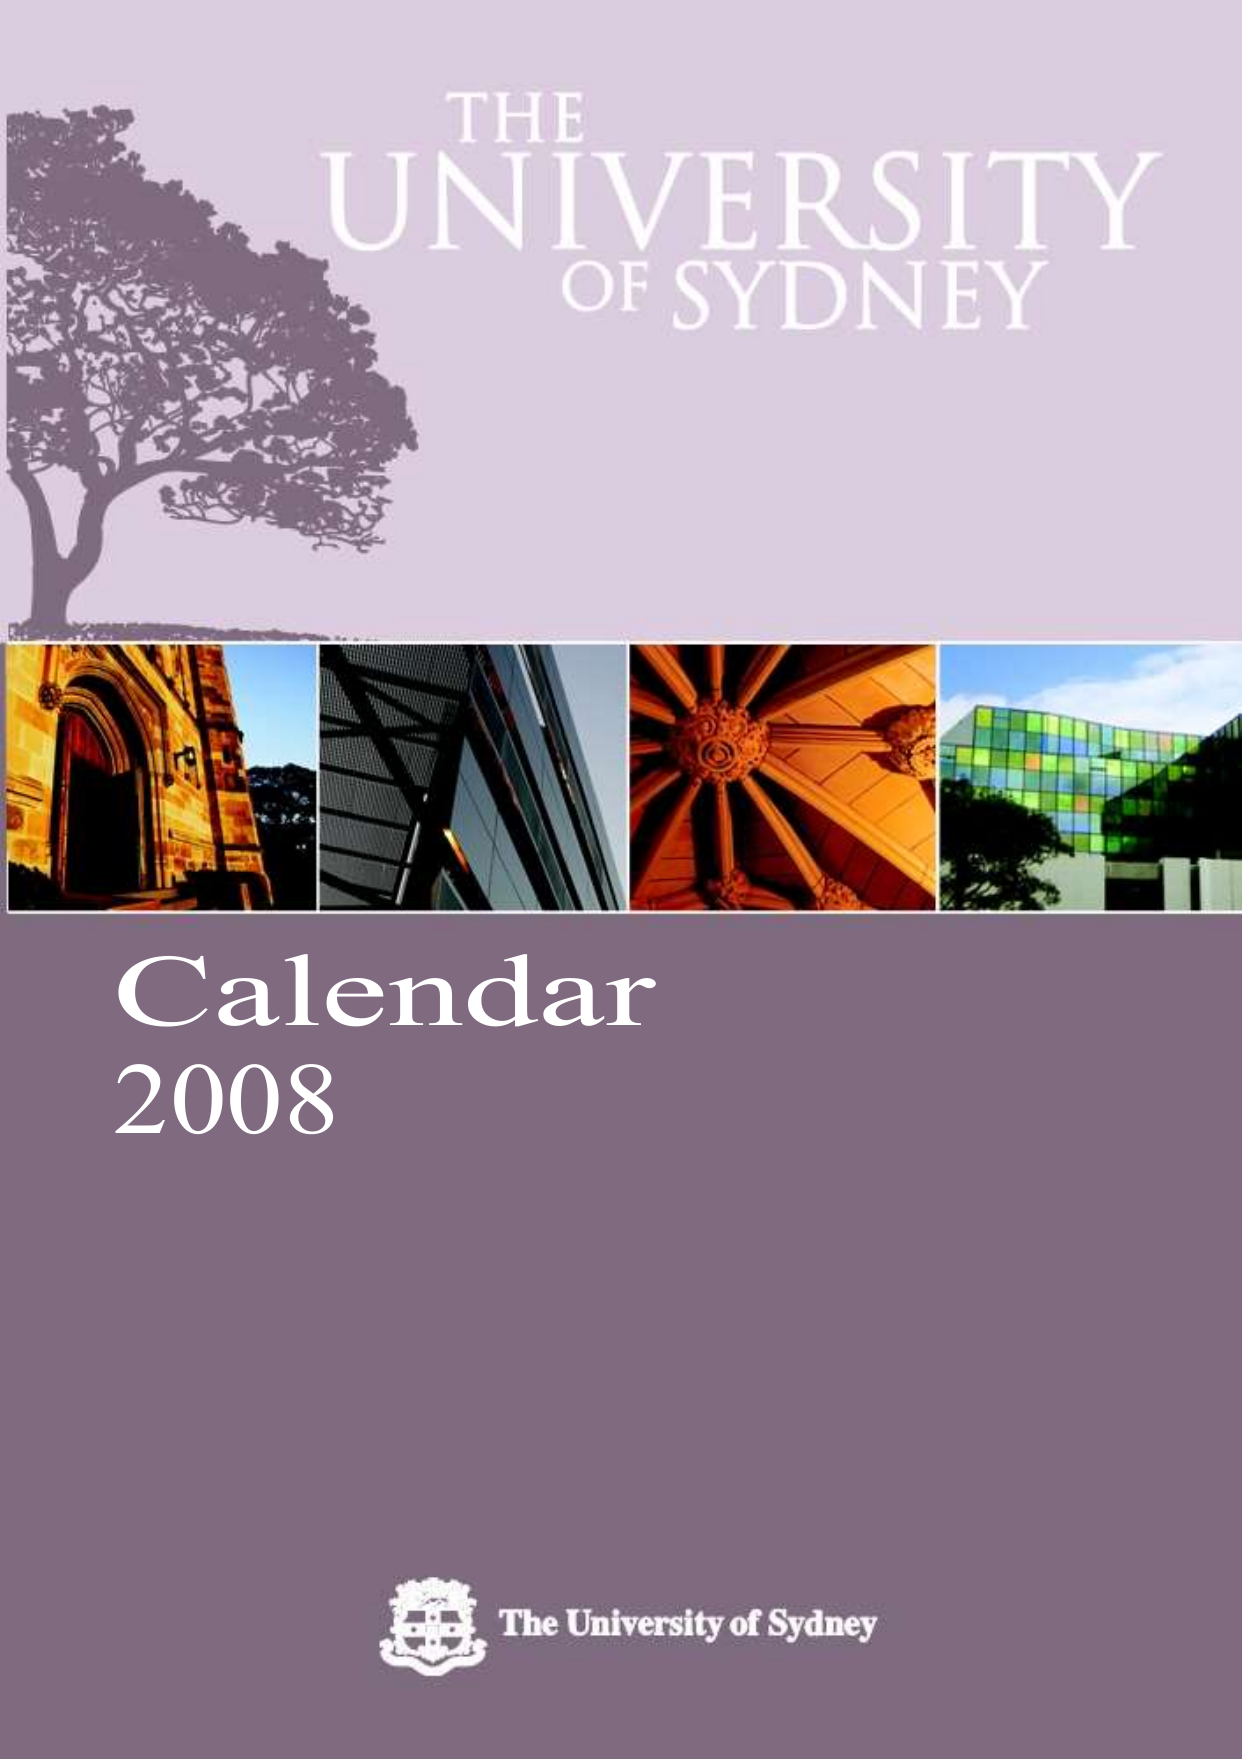 2008 Calendar Archive